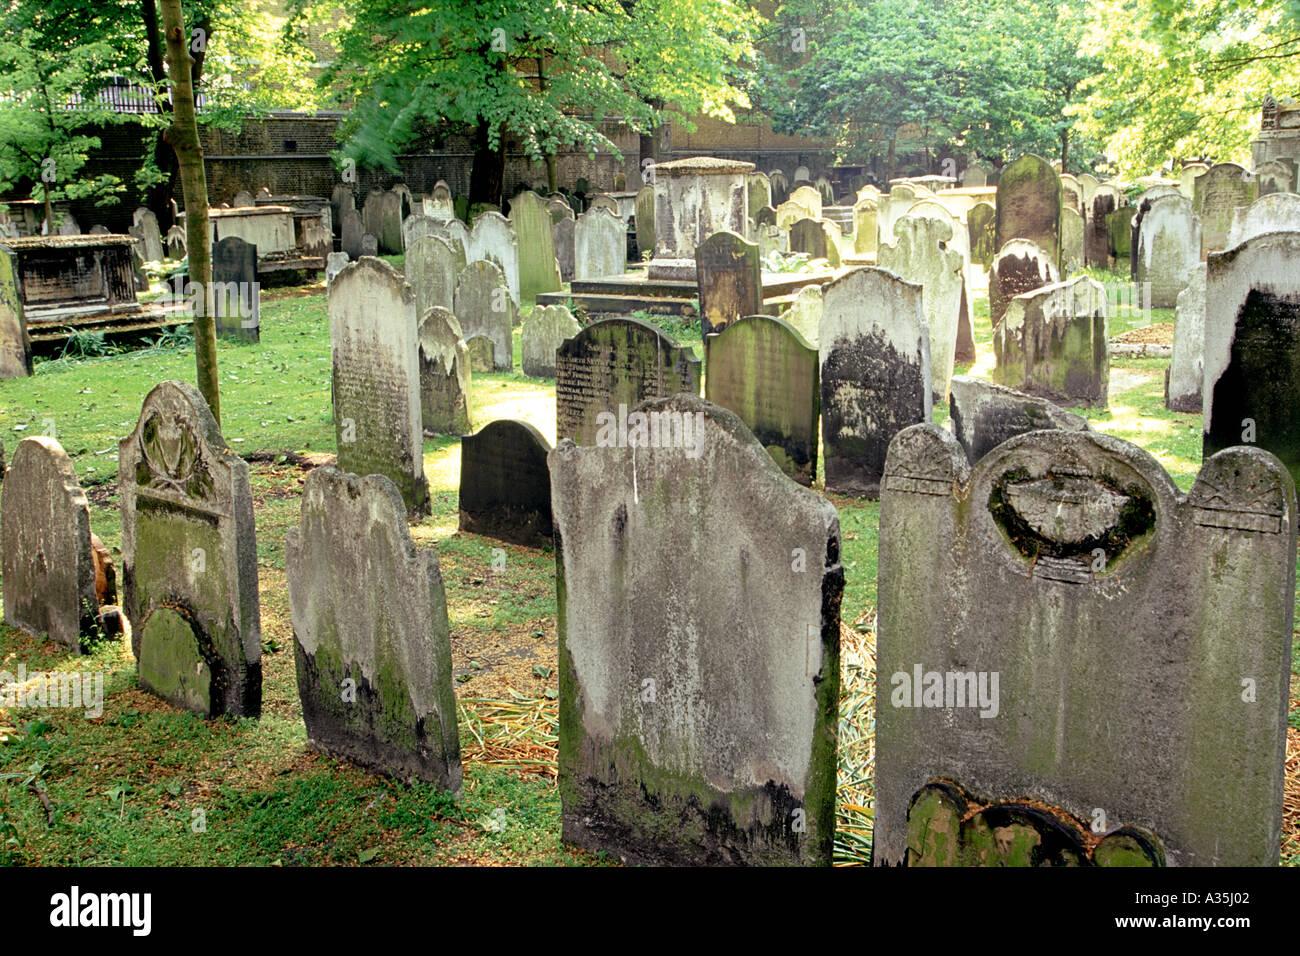 Bunhill Fields, a Victorian-era cemetery in London. - Stock Image